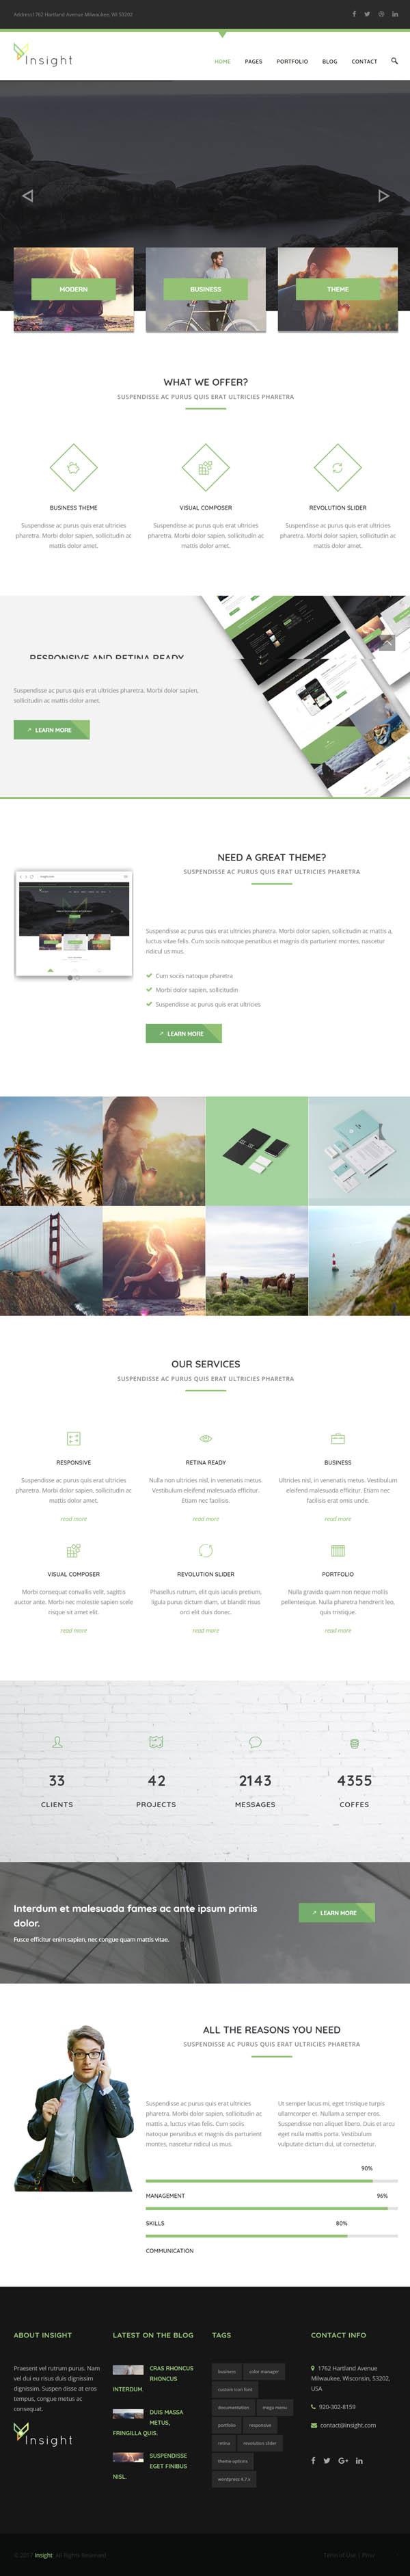 Insight - Premium Business WordPress Theme